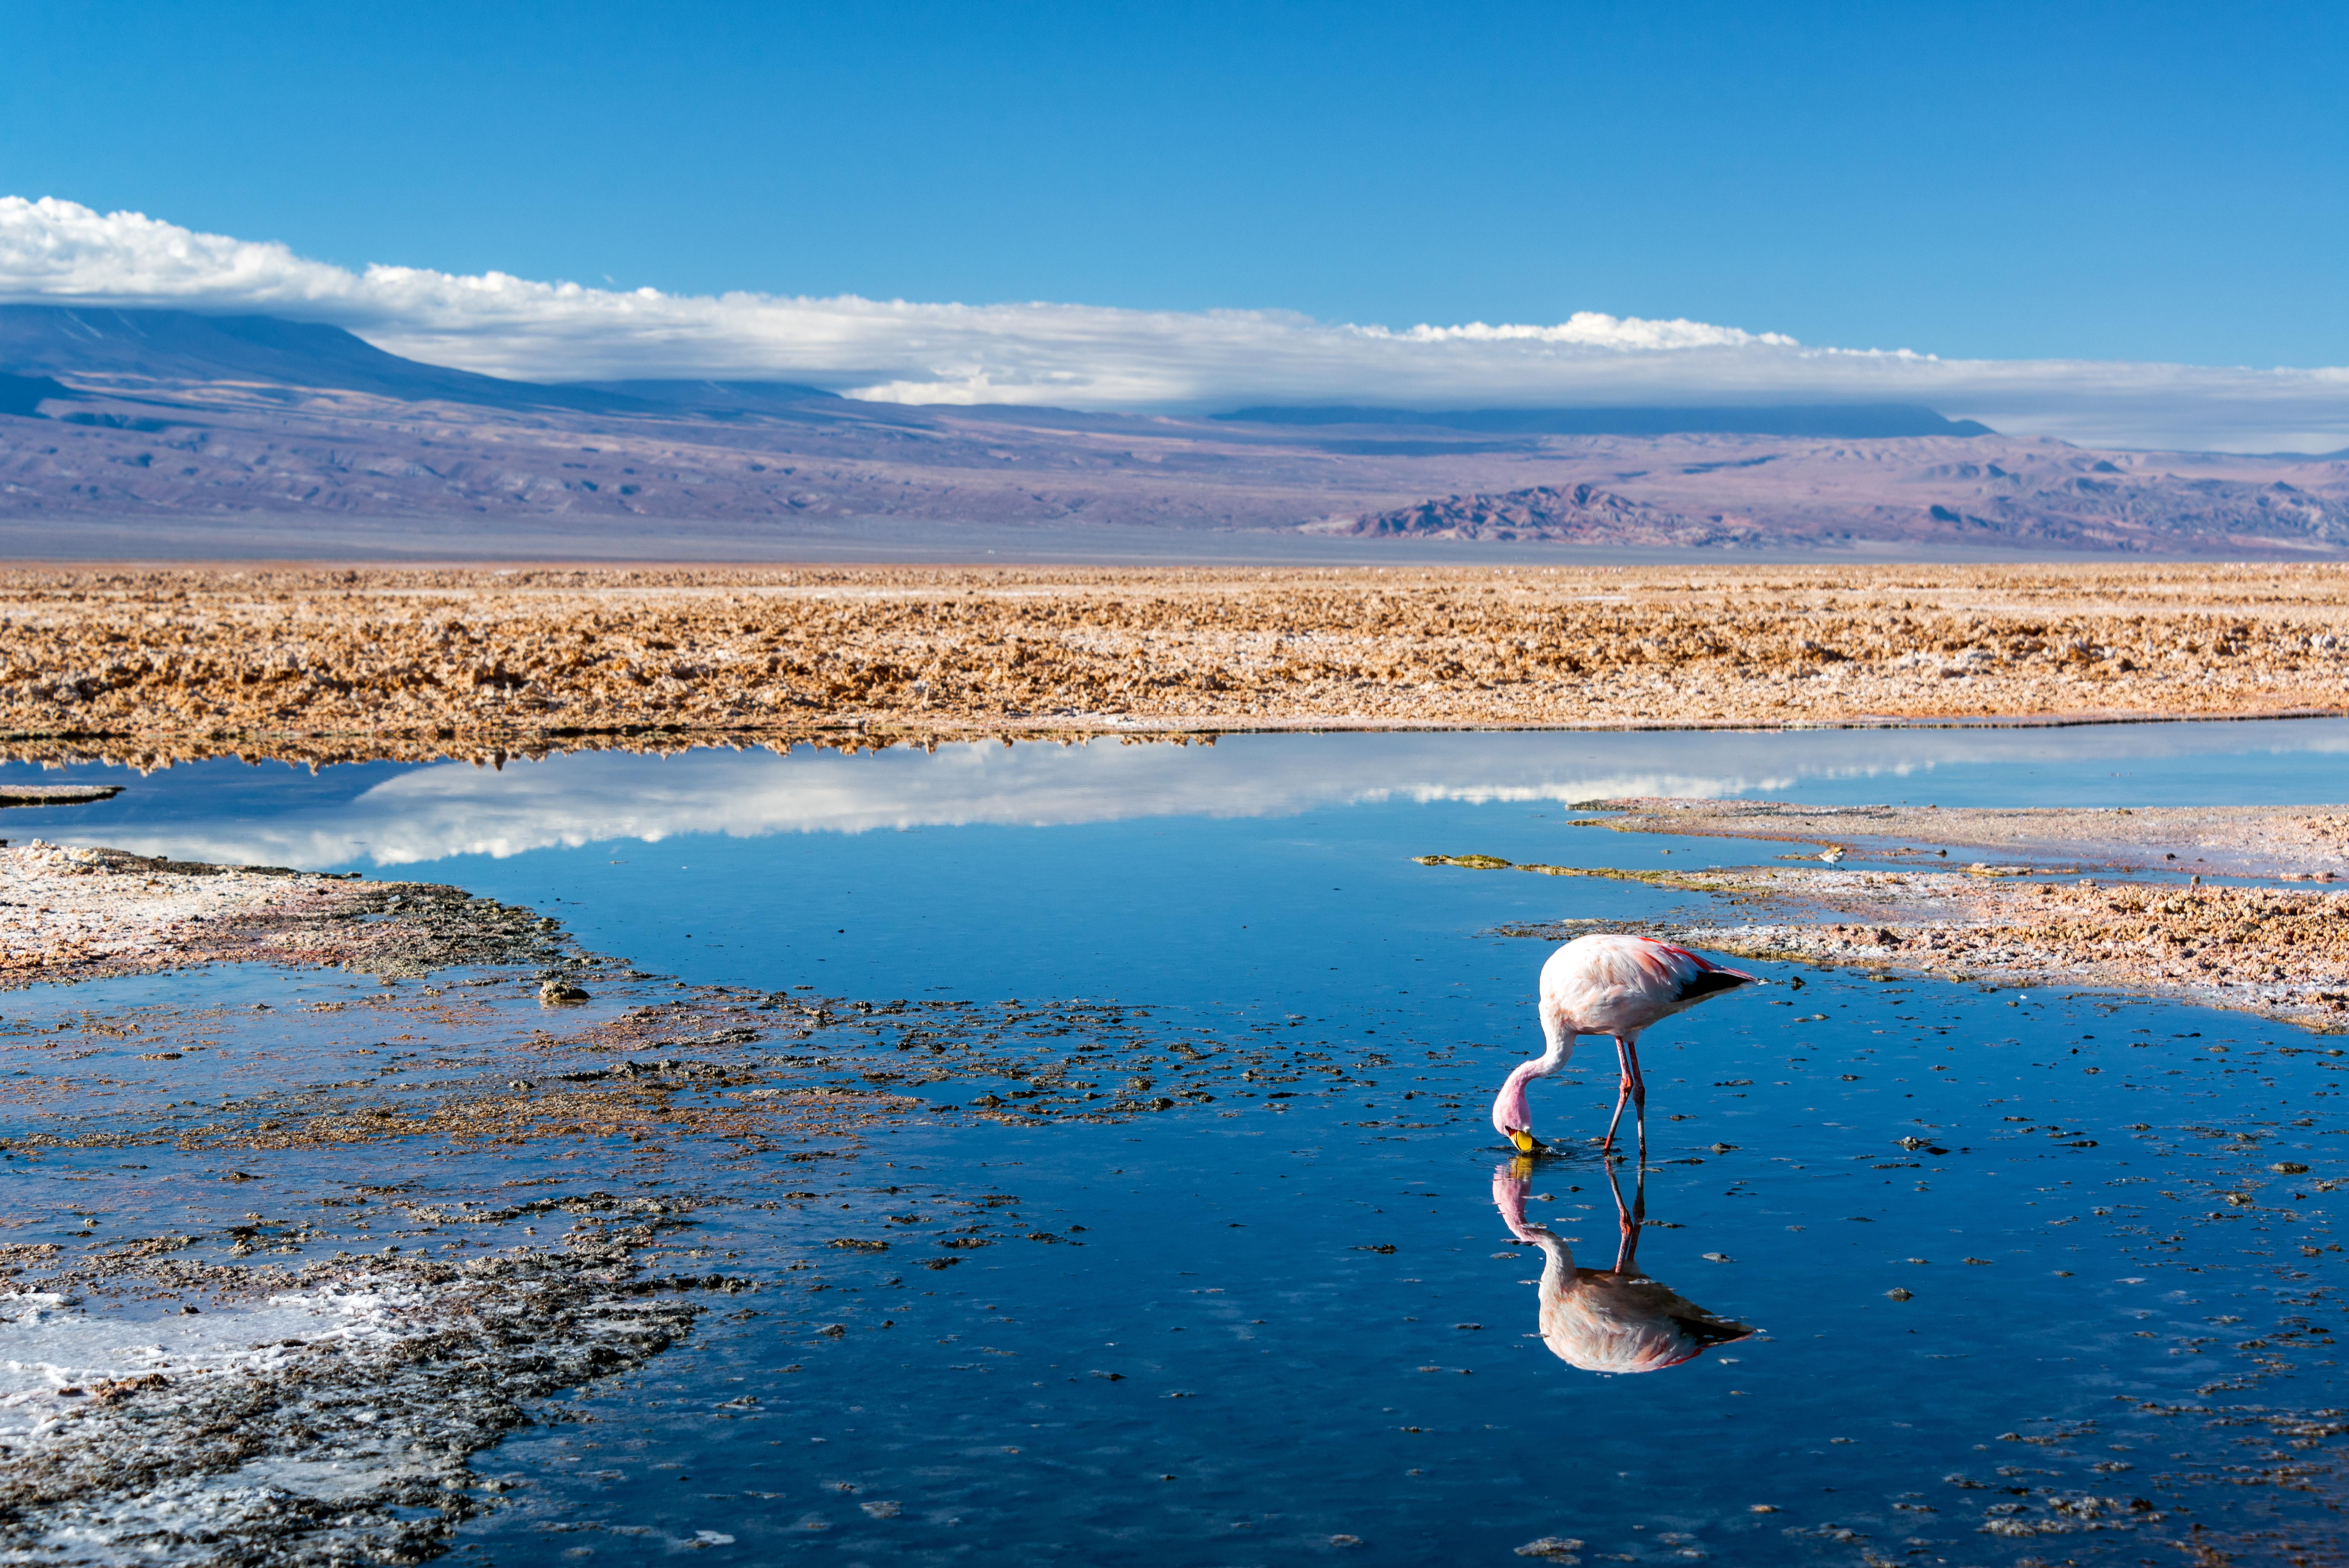 https://assets.eberhardt-travel.de/2018/Chile/60065_Flamingo_im_Salzsee_Chile_Original.jpg